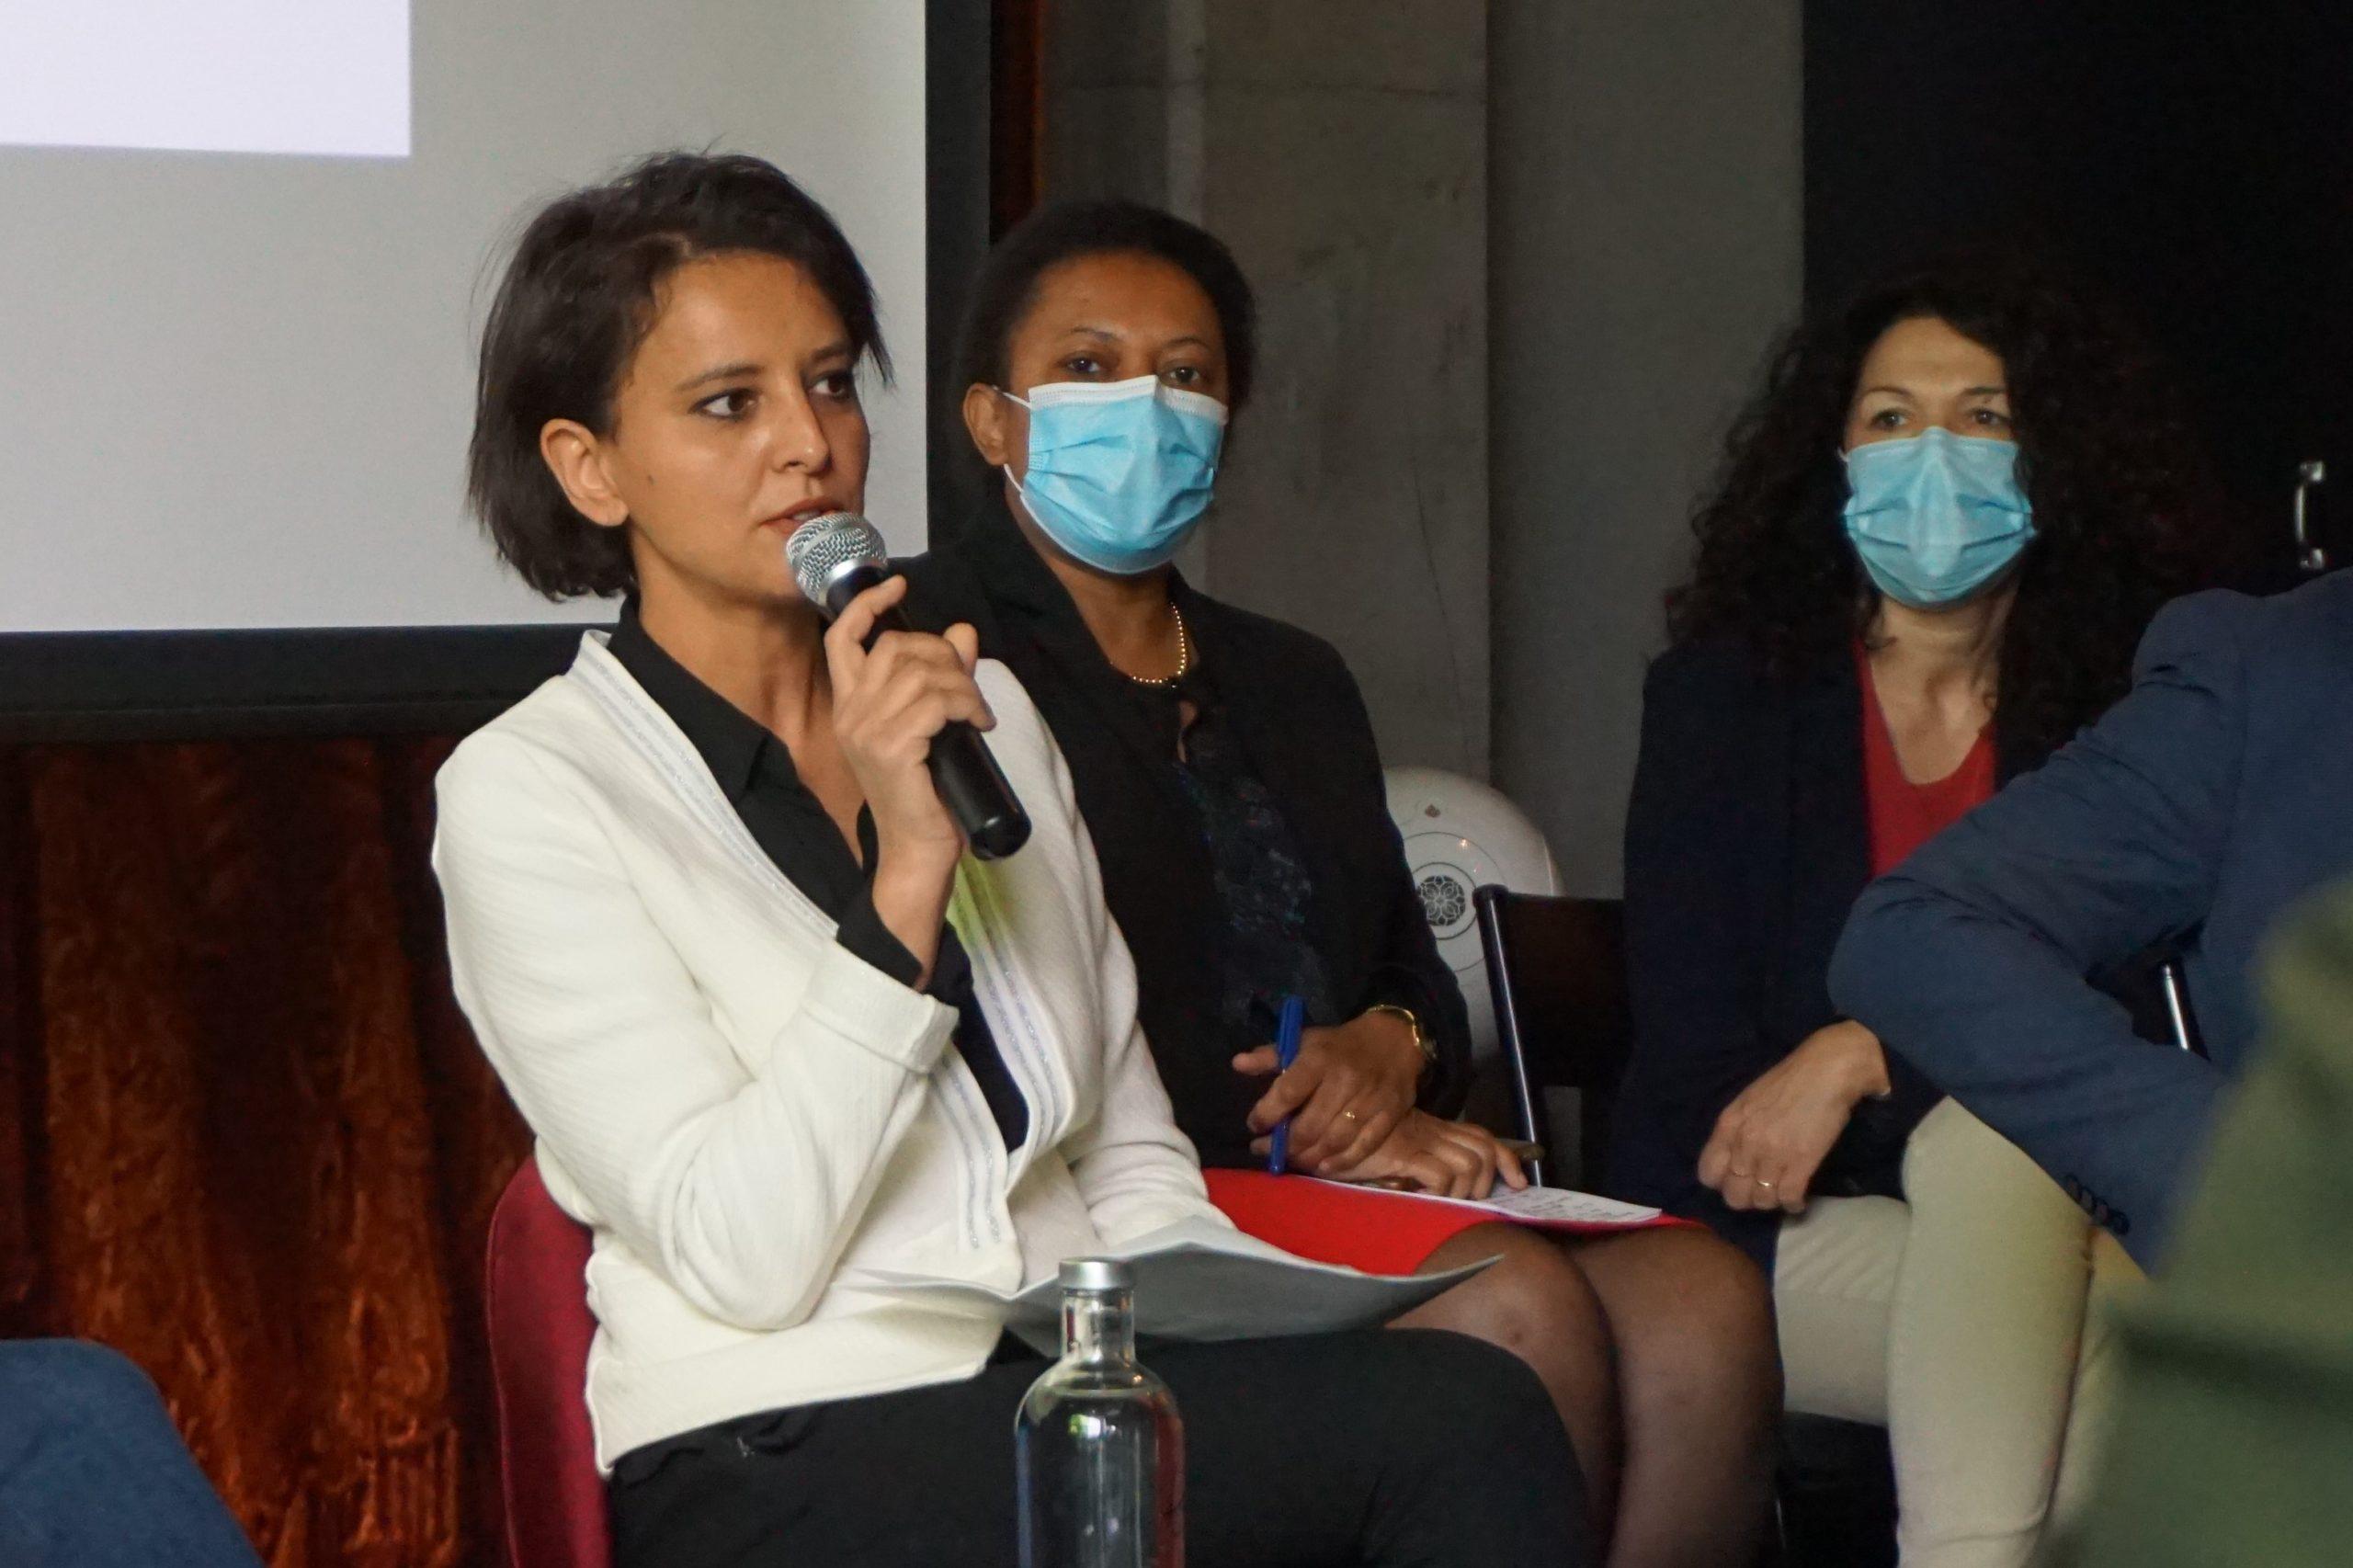 Najat Vallaud-Belkacem : « Une urgence absolue de prendre soin de notre jeunesse » – PARTIE 2